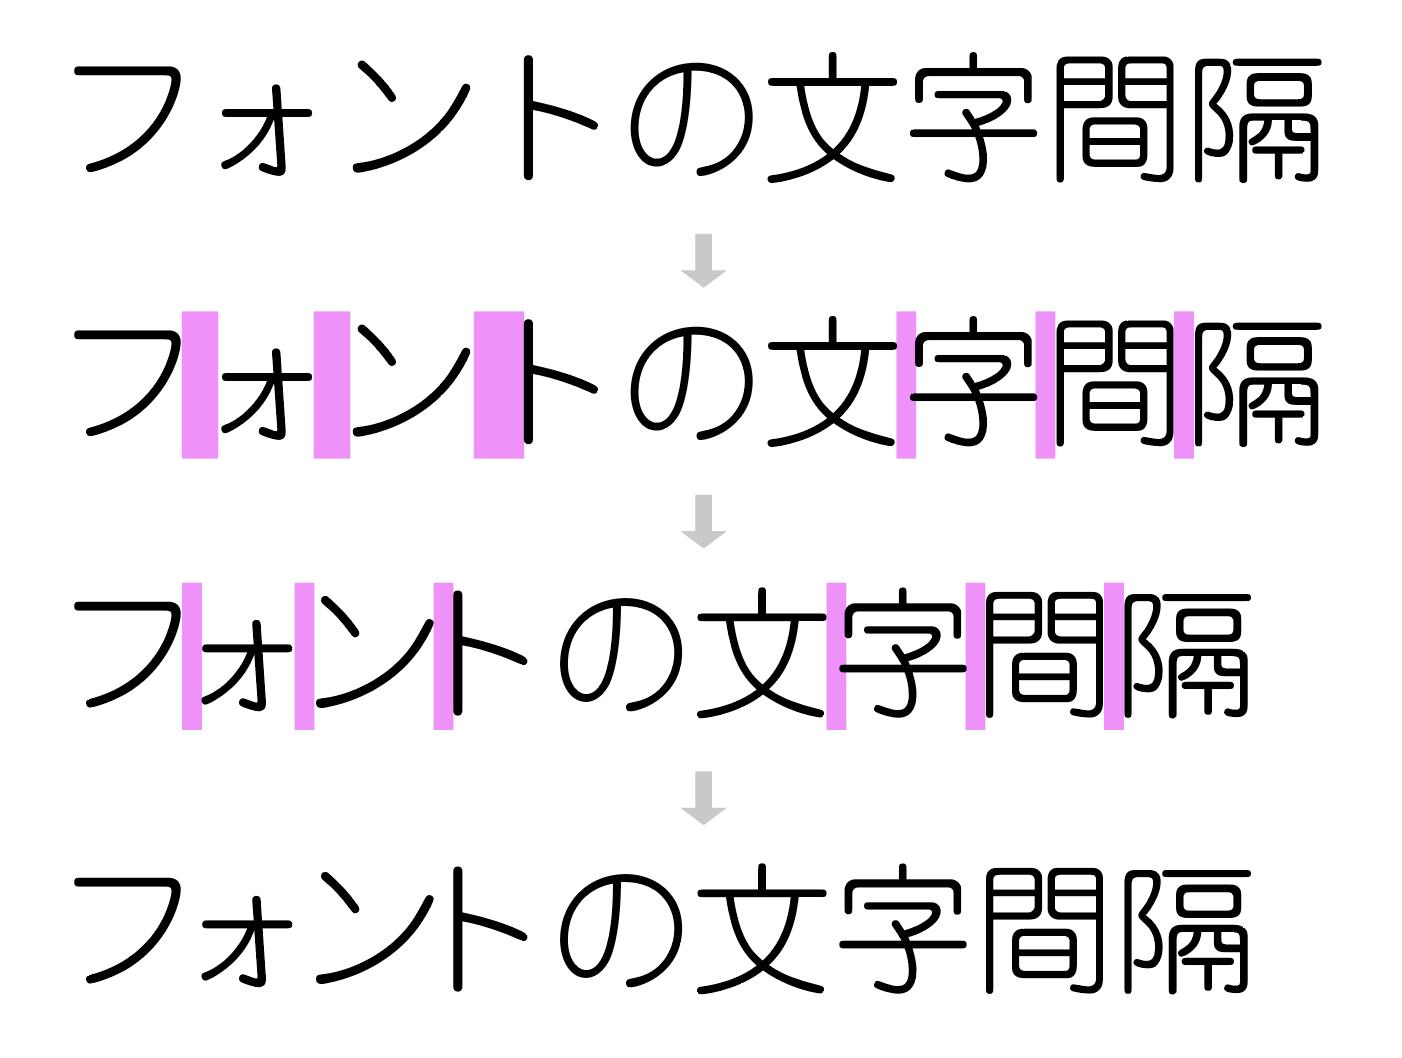 Illustrator_typesetting04